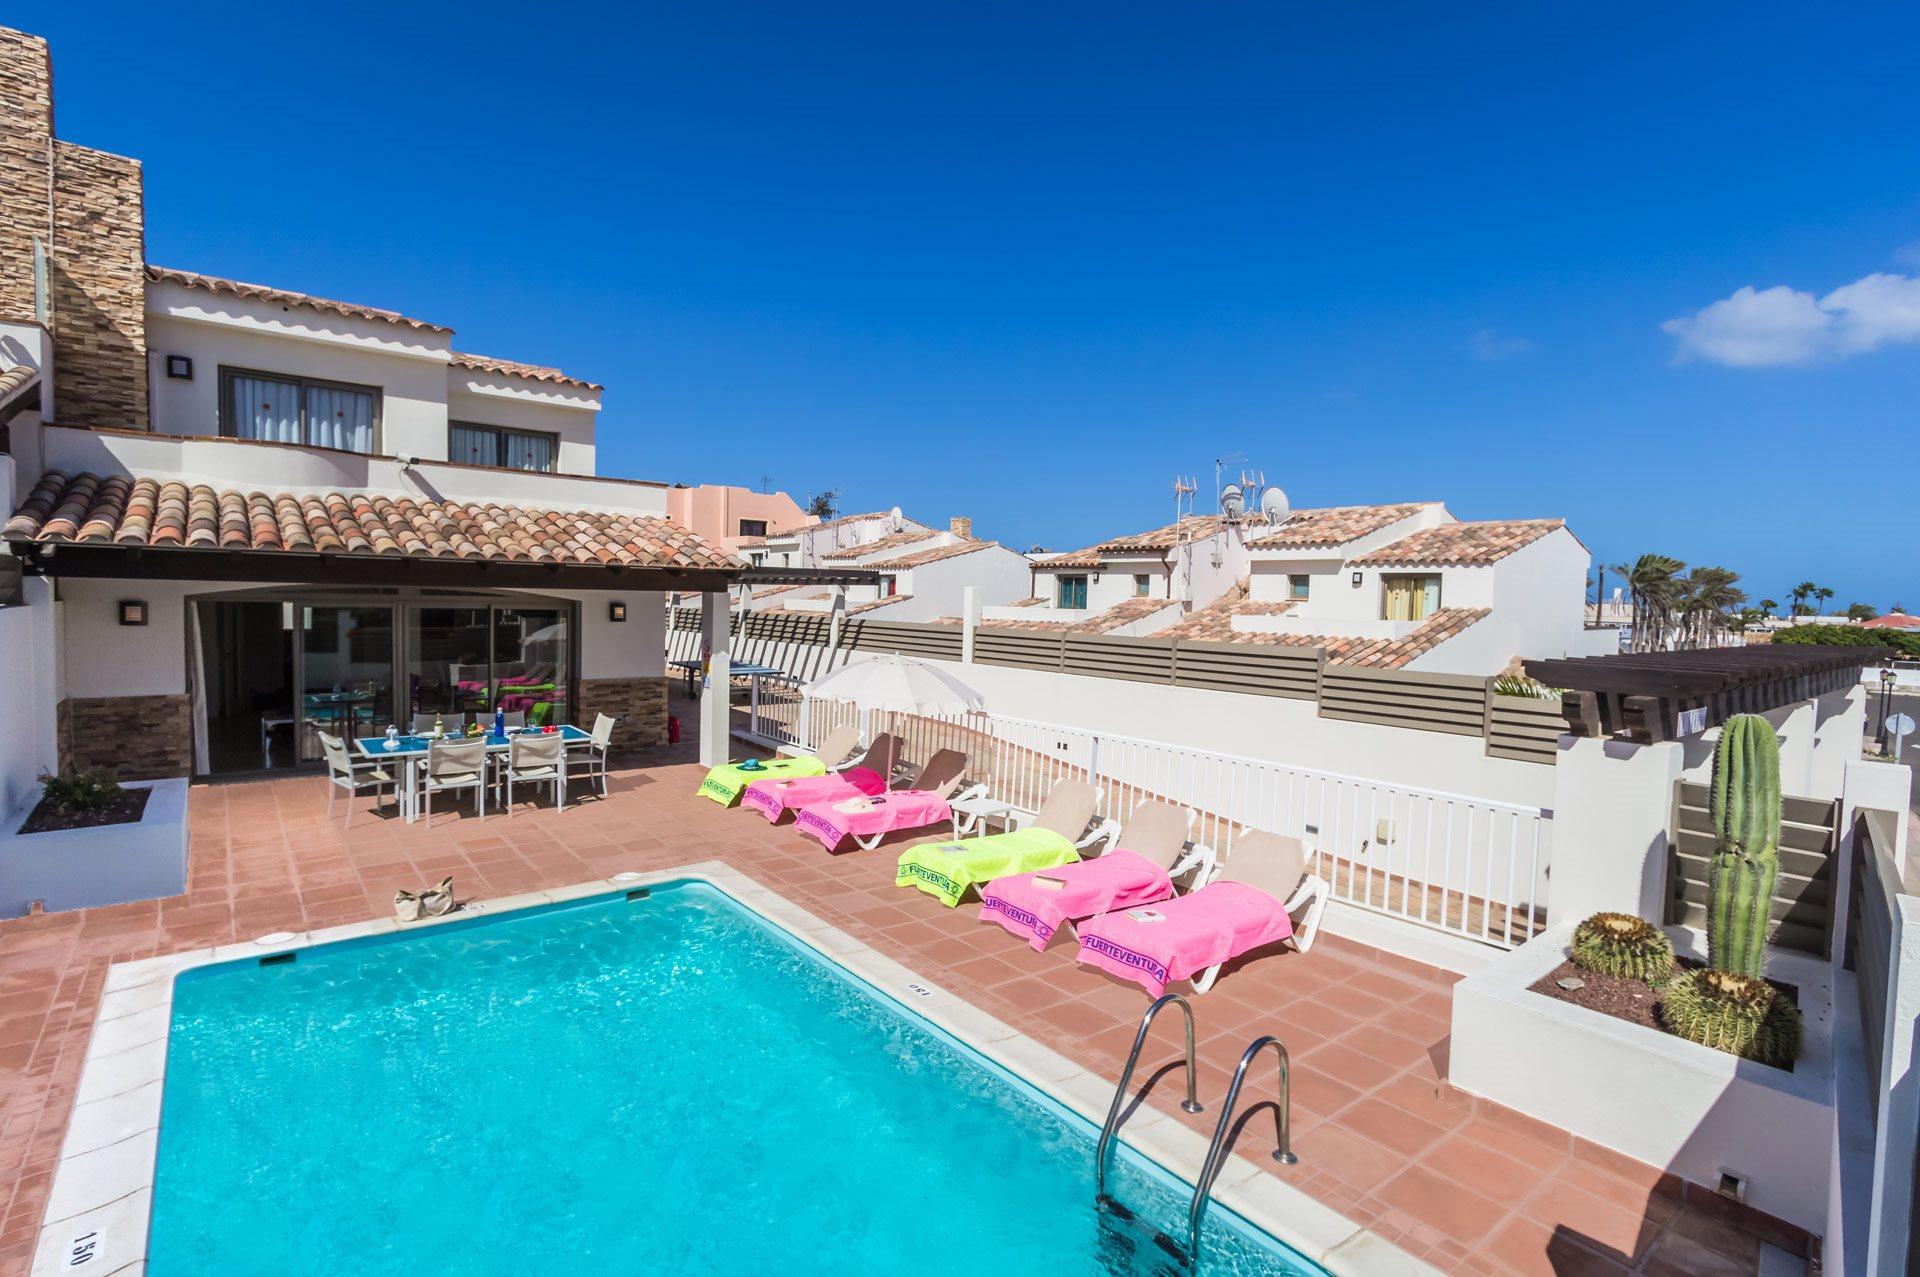 Villa Sirena, Corralejo, Fuerteventura